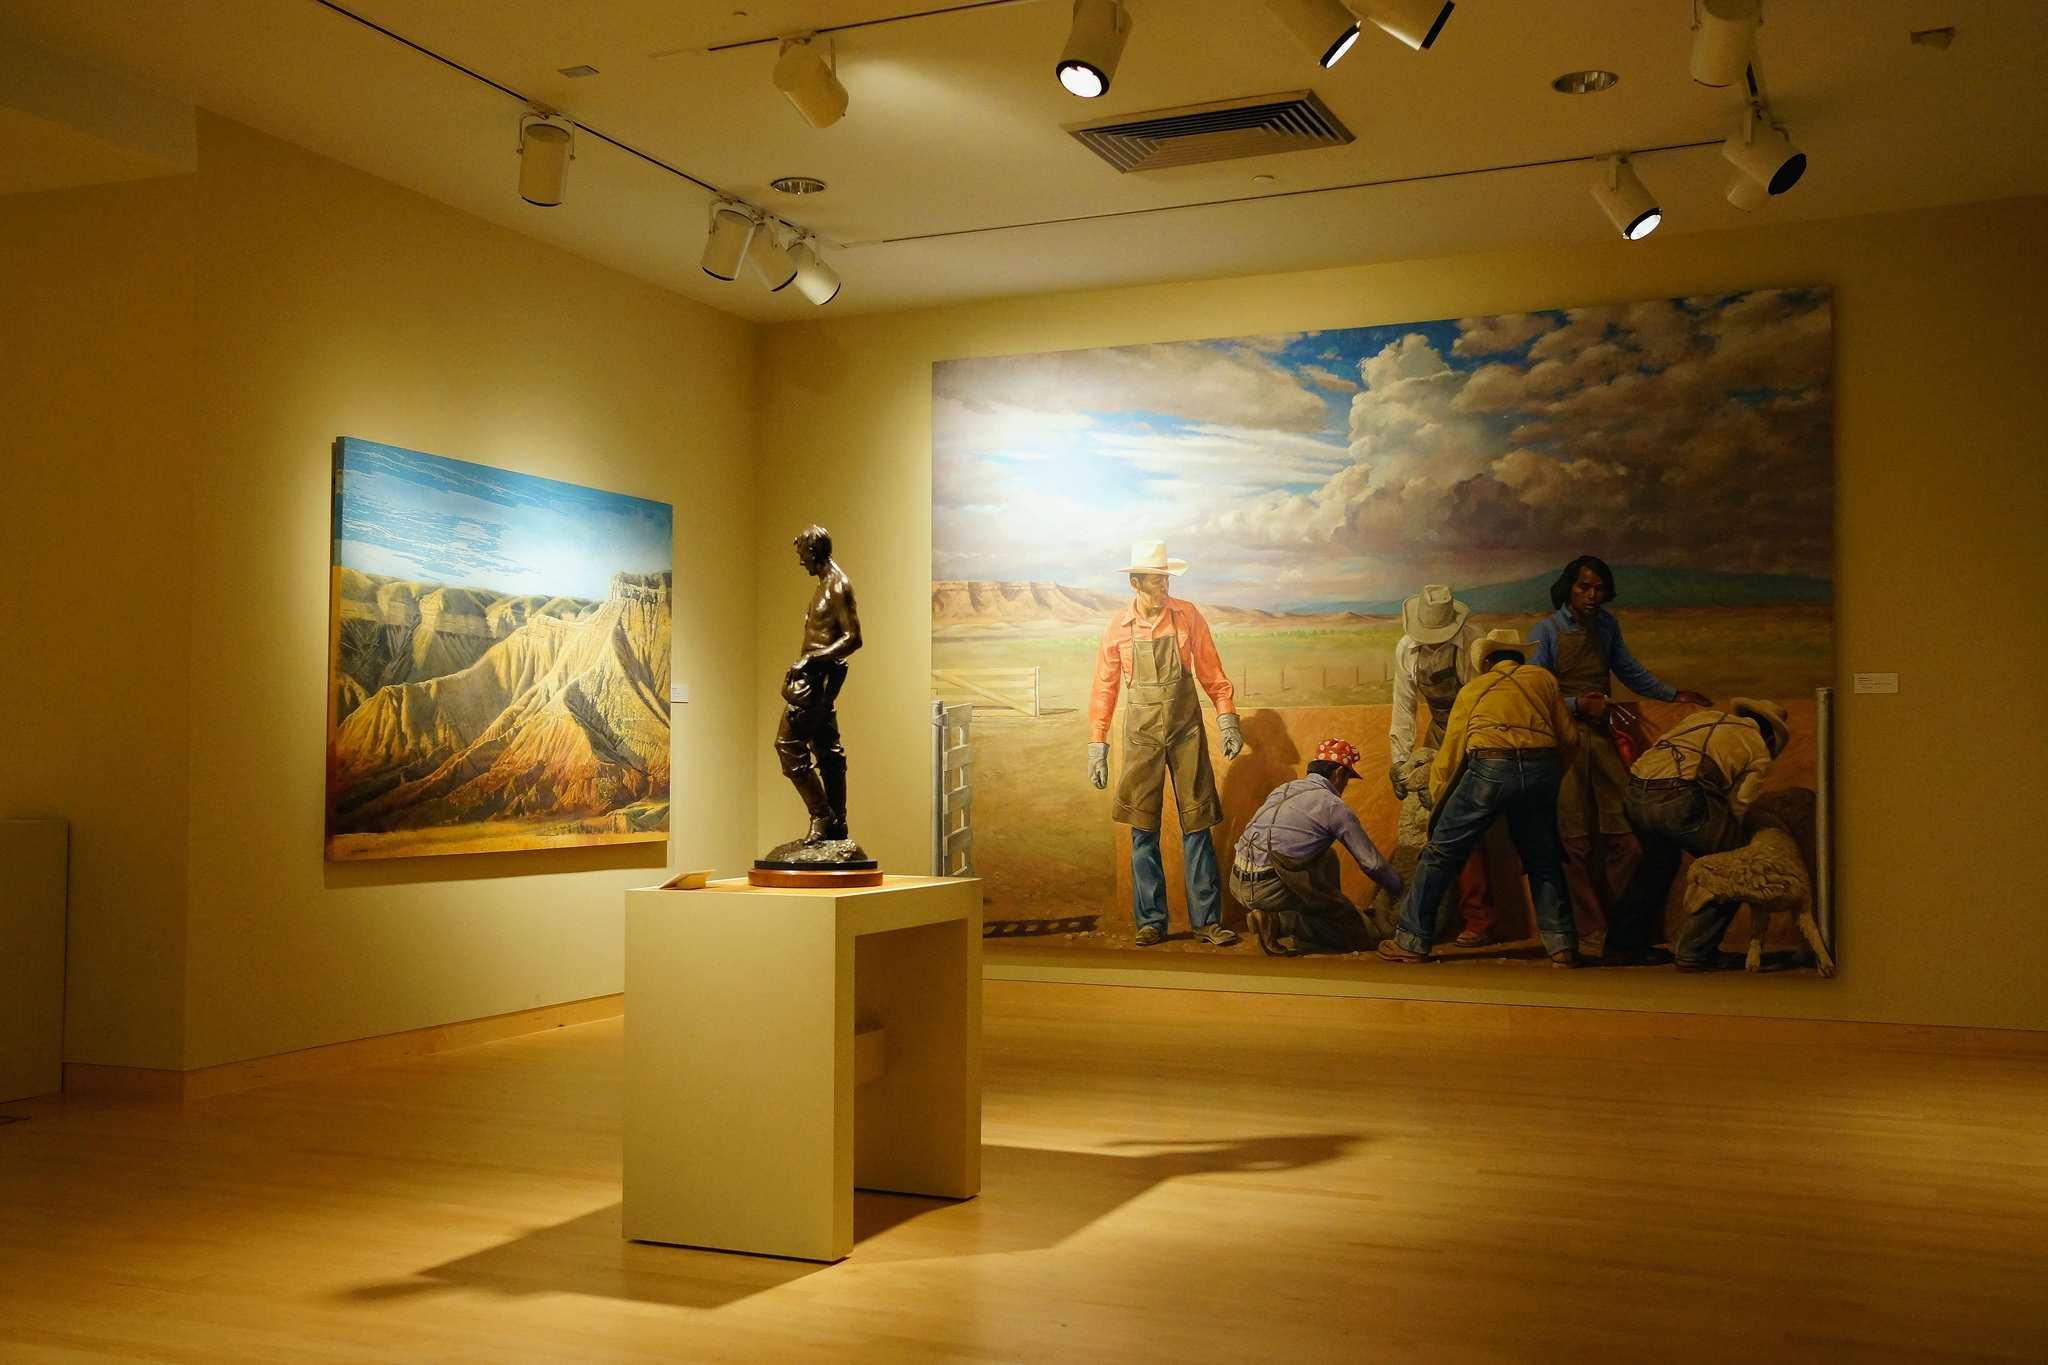 art exhibit room at Phoenix Art Museum